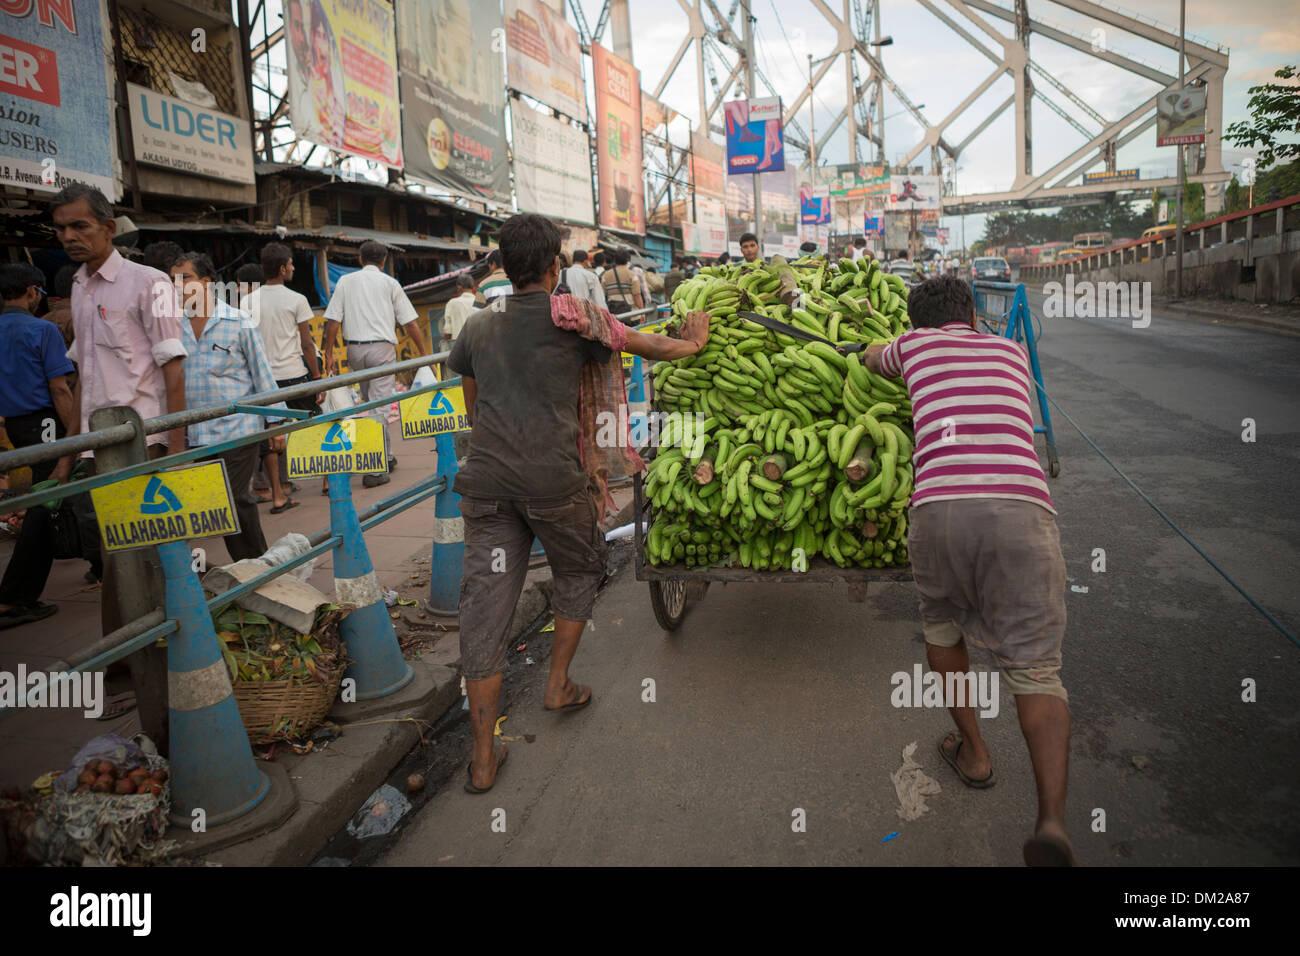 Street cart full of bananas crossing the Howrah Bridge in Calcutta (Kolkata), India - Stock Image